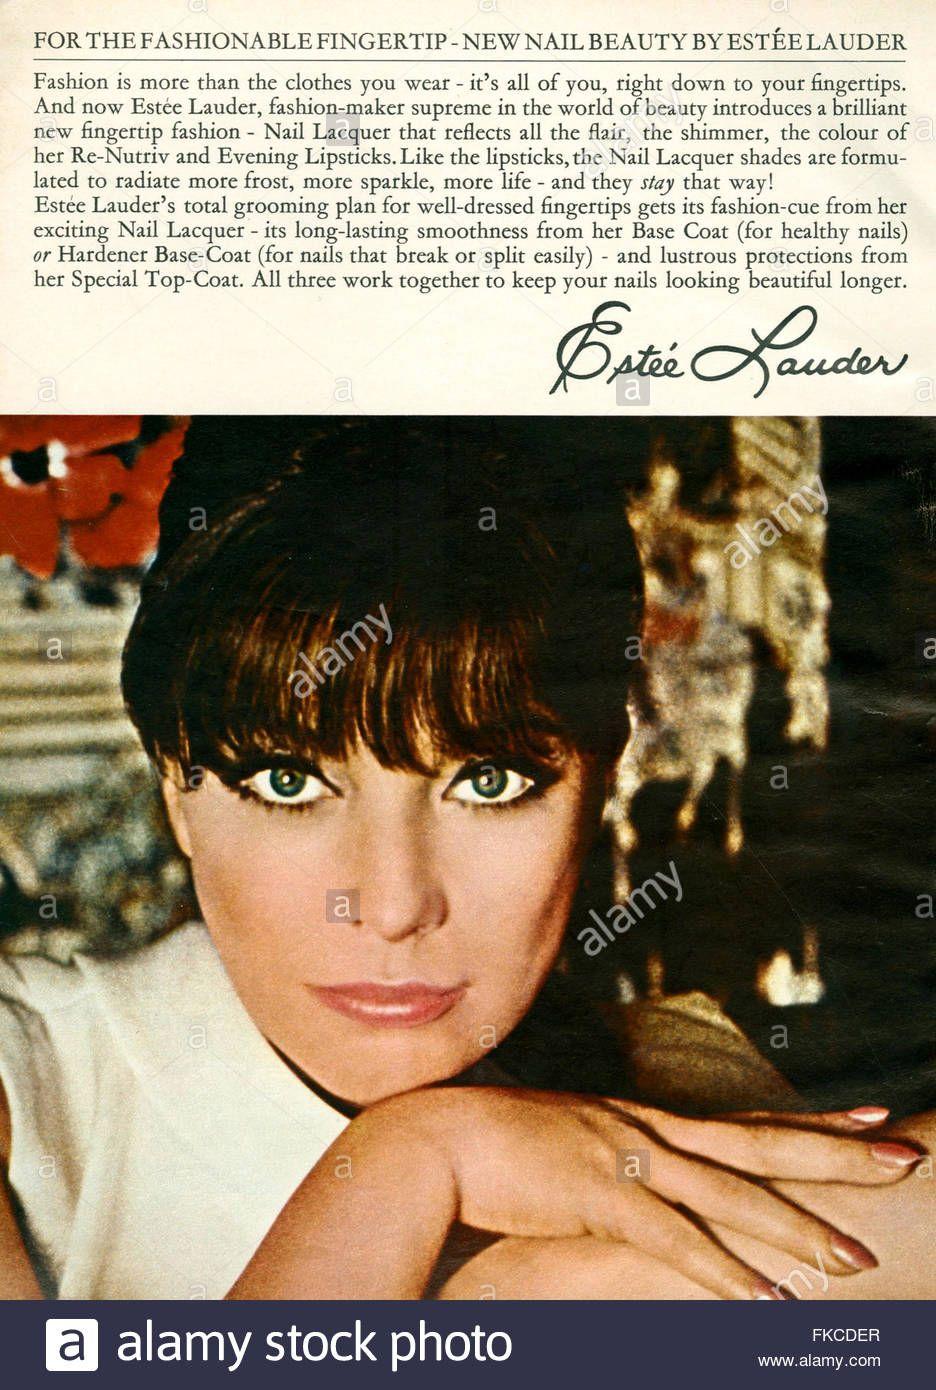 1960s UK Estee Lauder Magazine Advert Stock Photo